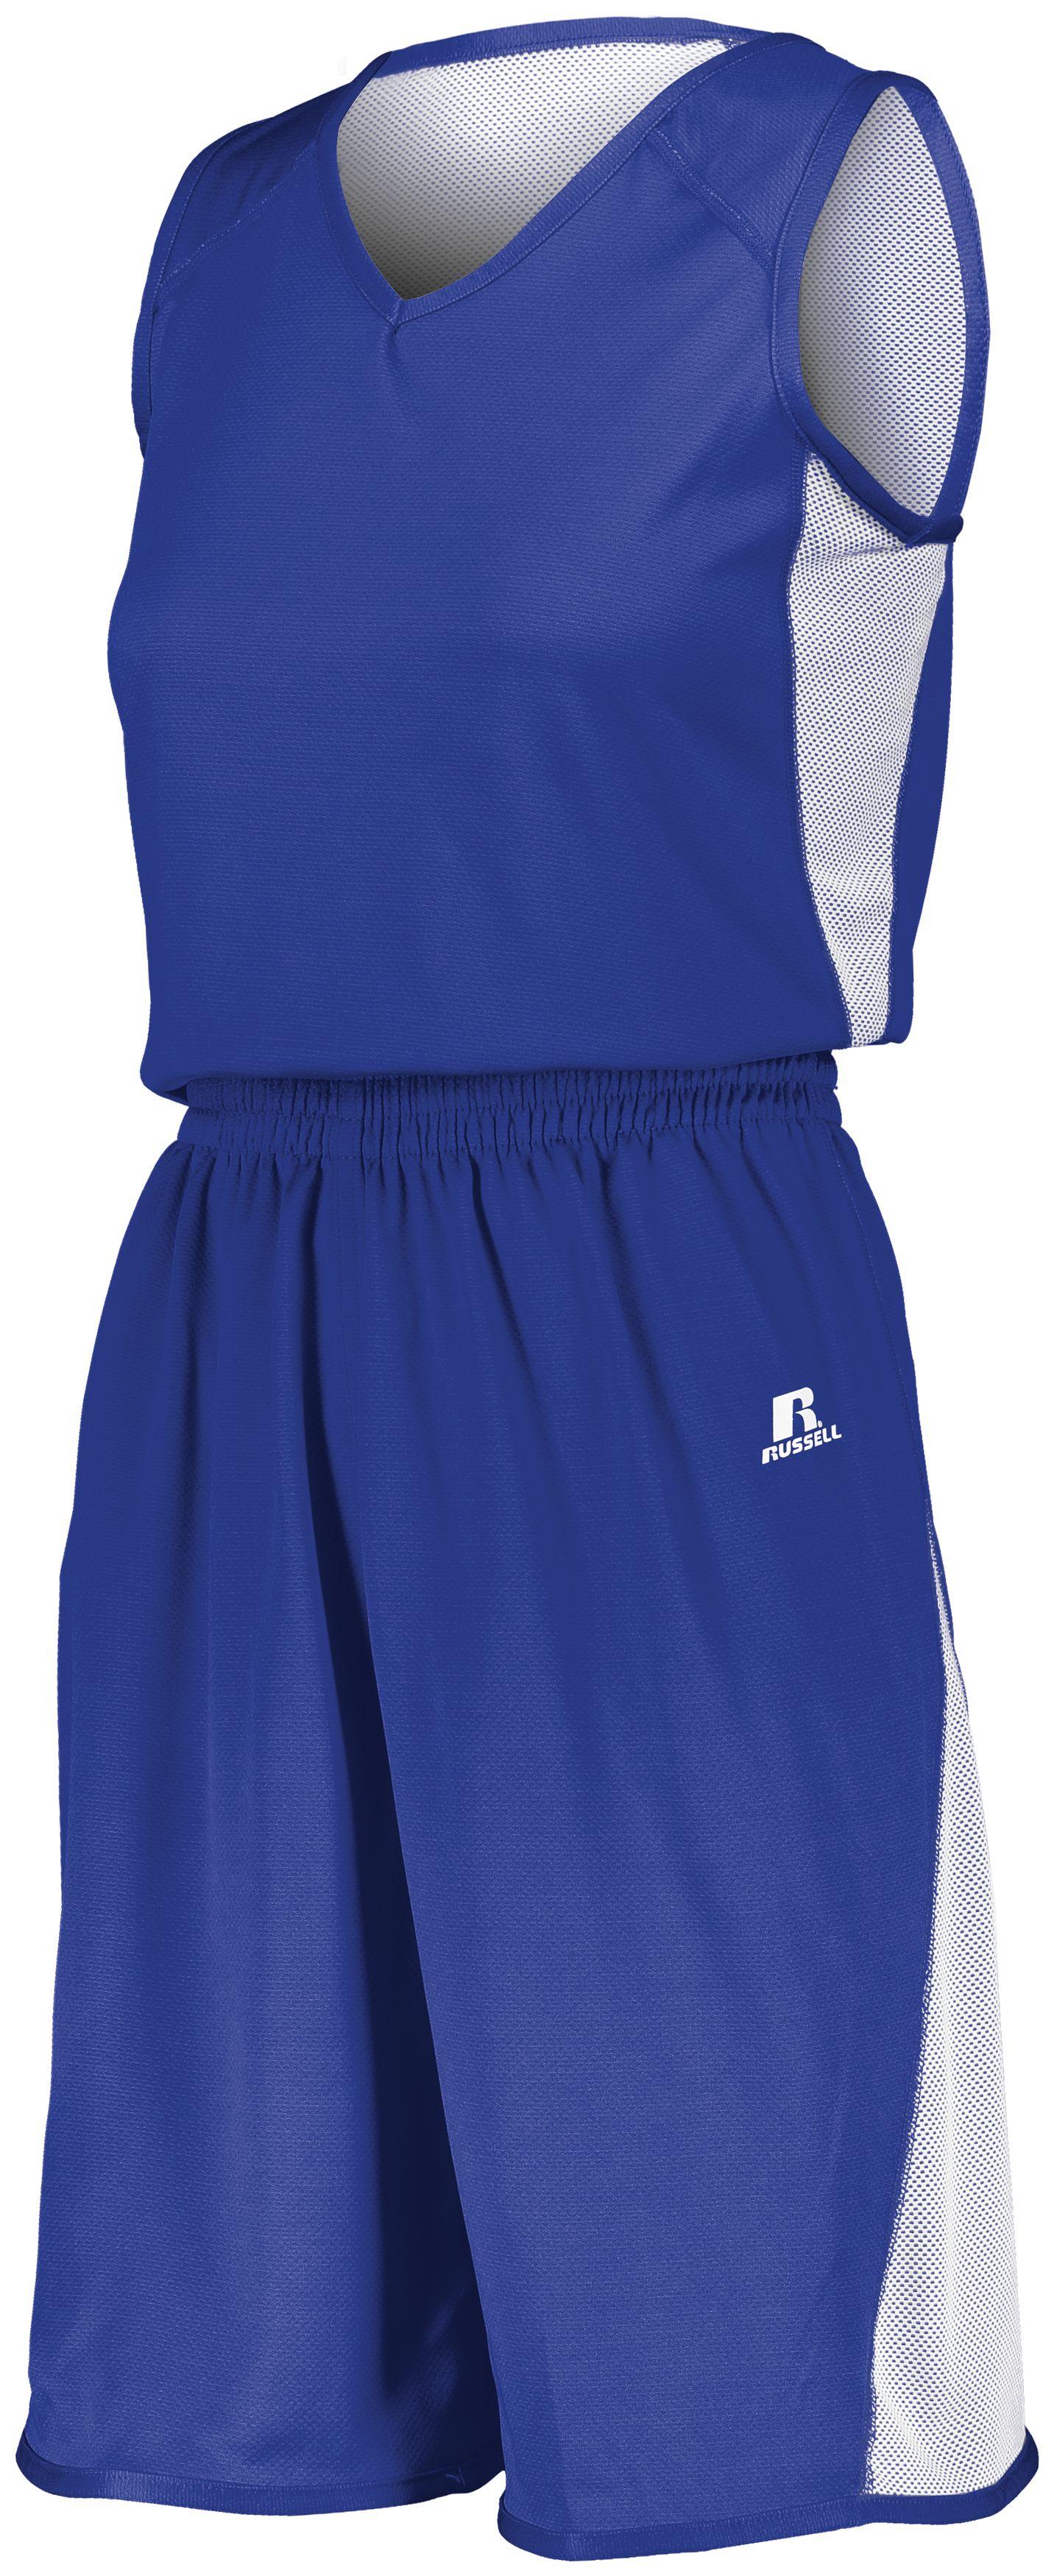 Ladies Undivided Single Ply Reversible Shorts - ROYAL/WHITE